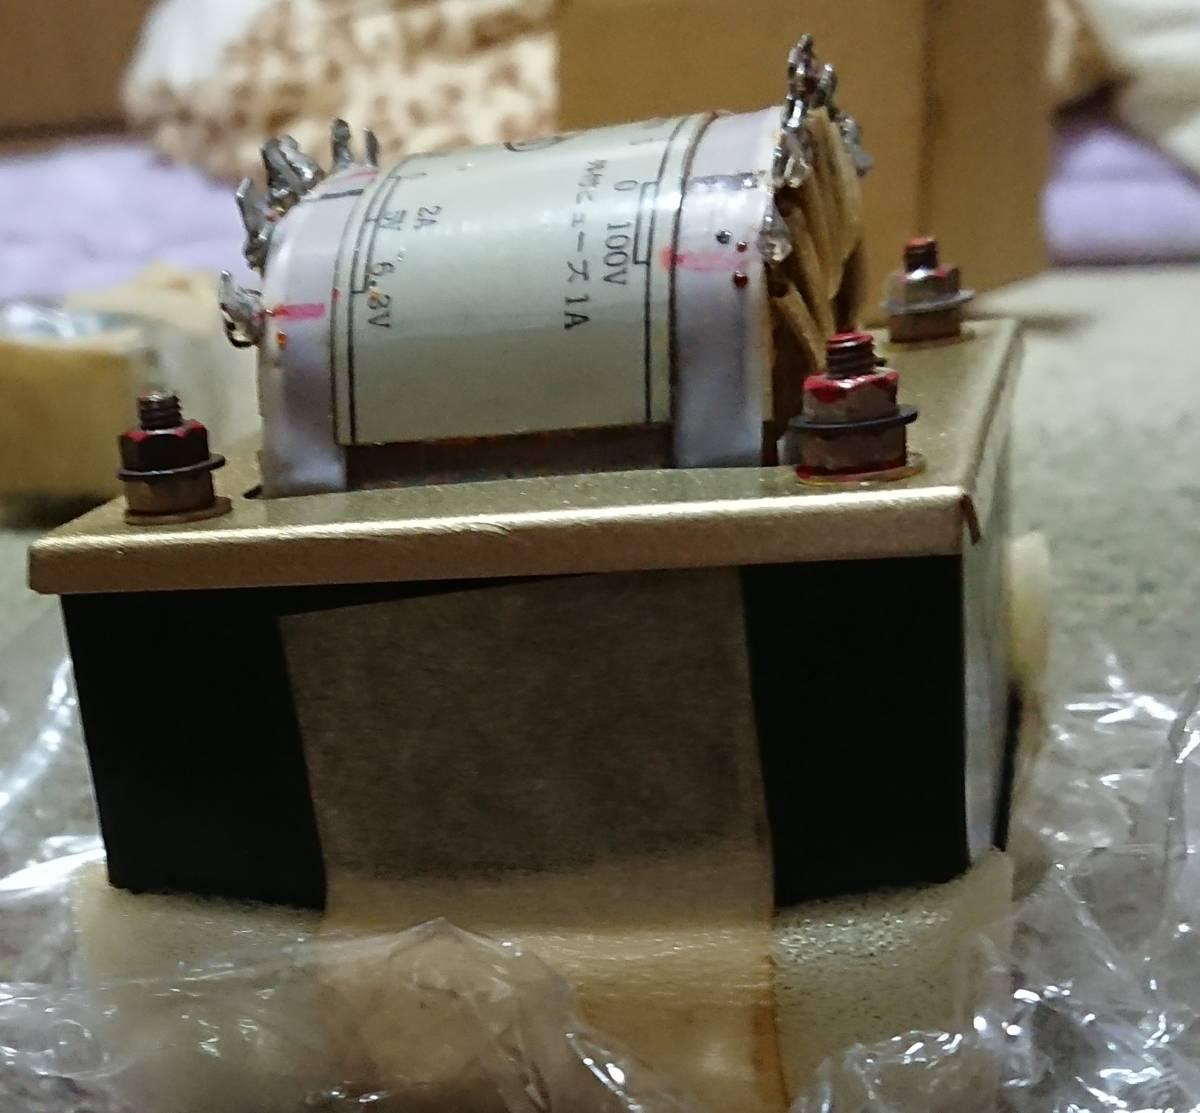 PH-100S 電源トランス _画像5